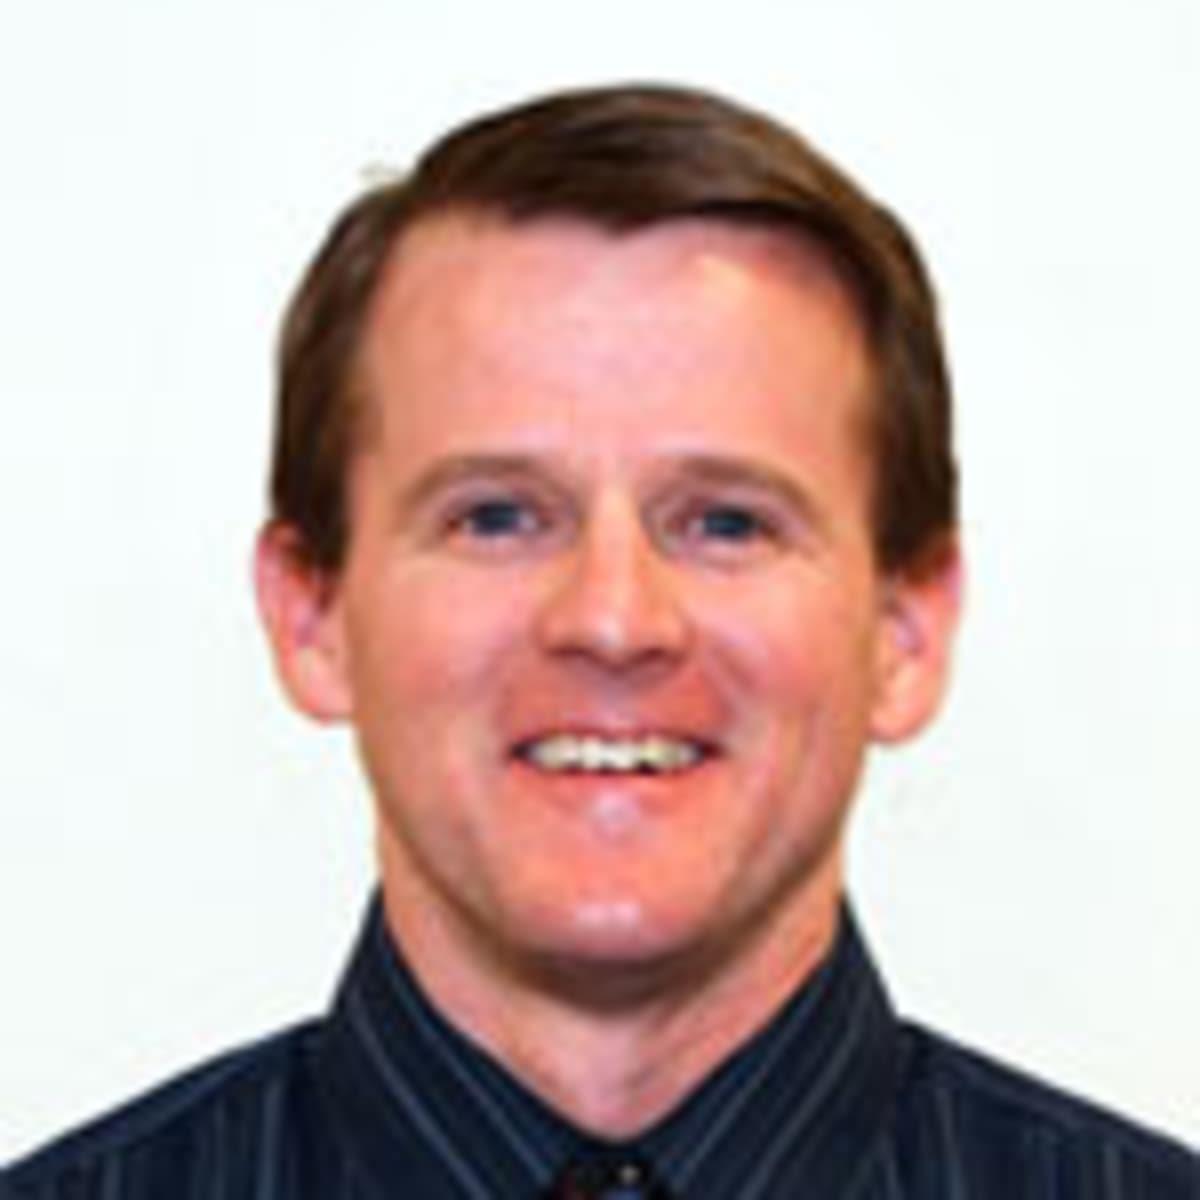 Dr. Michael Cavanagh, MD